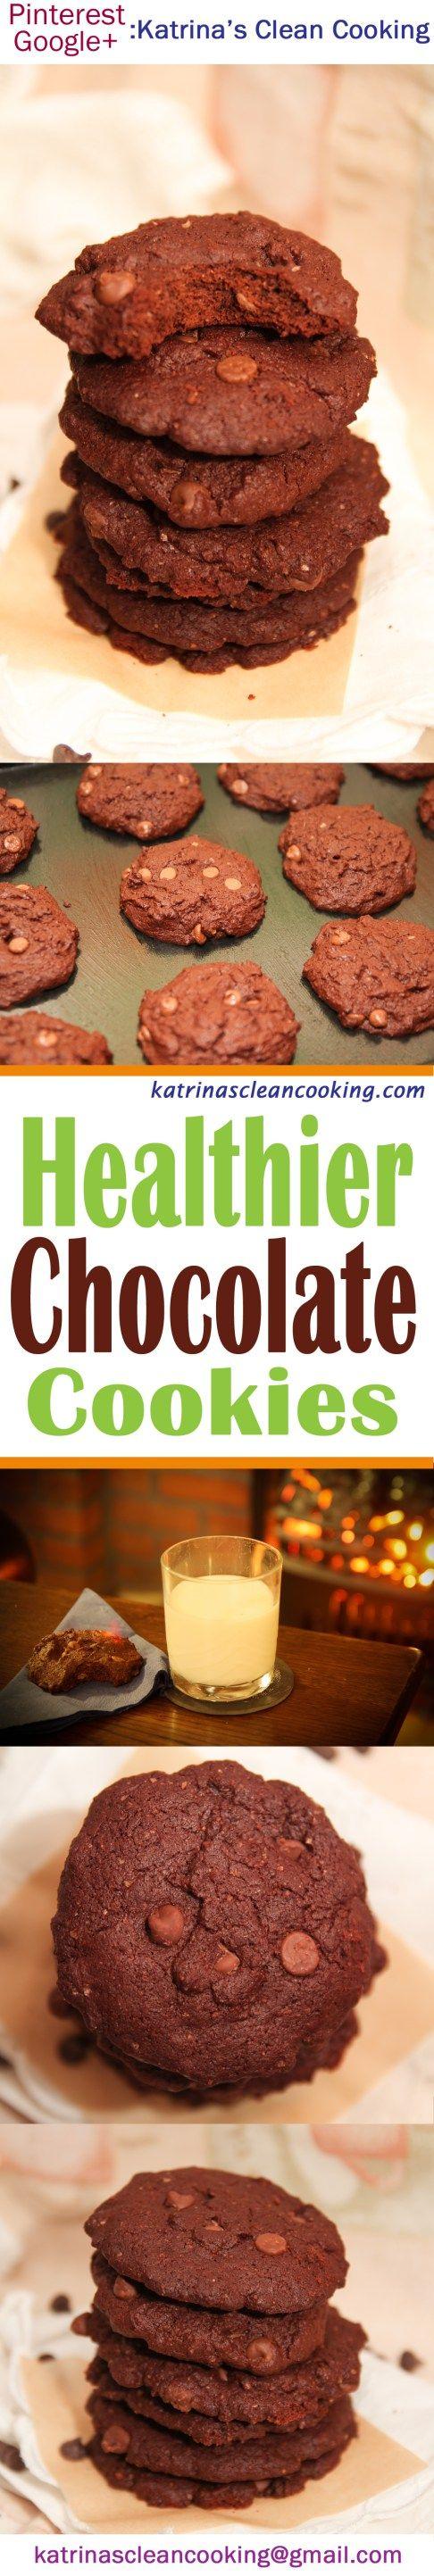 Healthier Dark Chocolate Cookies #healthy #chocolate #glutenfree #cookies #remembrance